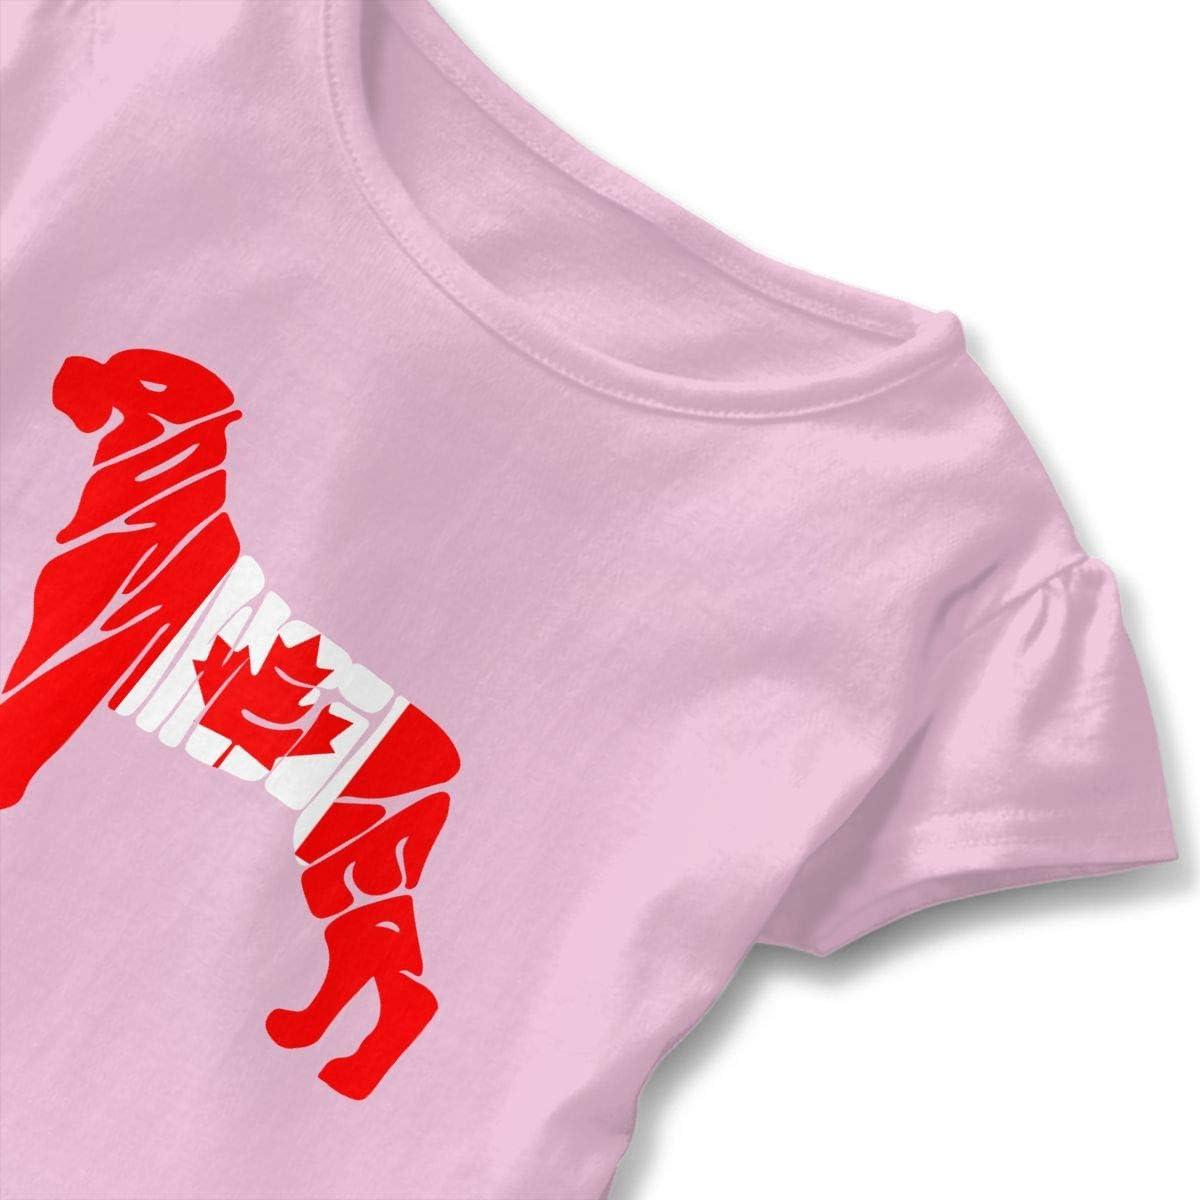 26NSHIRT Canada Flag Rottweiler Dog Baby Girls Short Sleeve Cotton T-Shirts